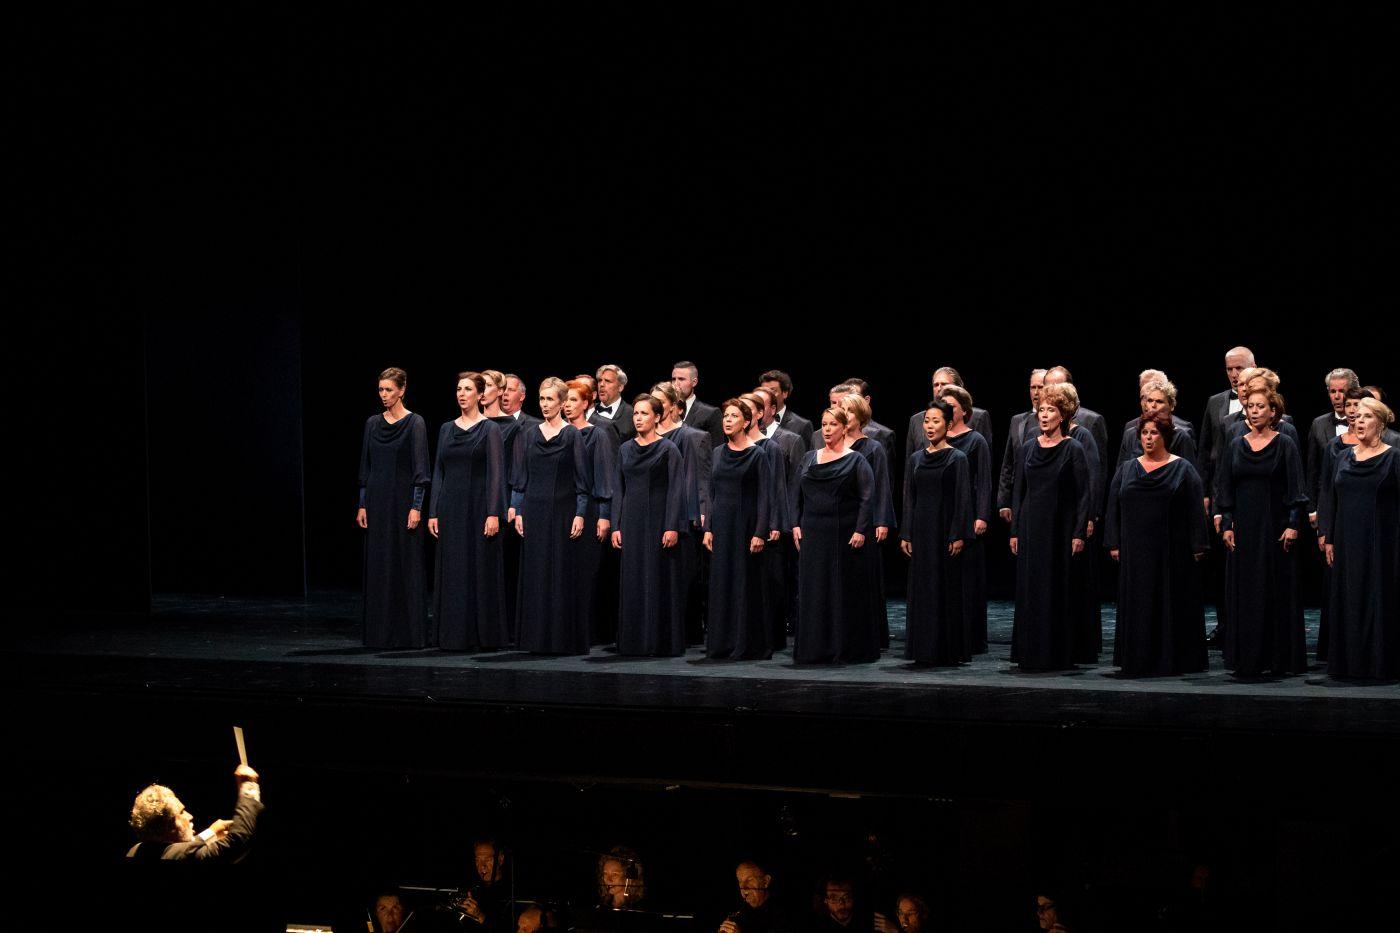 De Nationale Opera - Afscheid Pierre Audi - credits Michel Schnater-64_0.jpeg